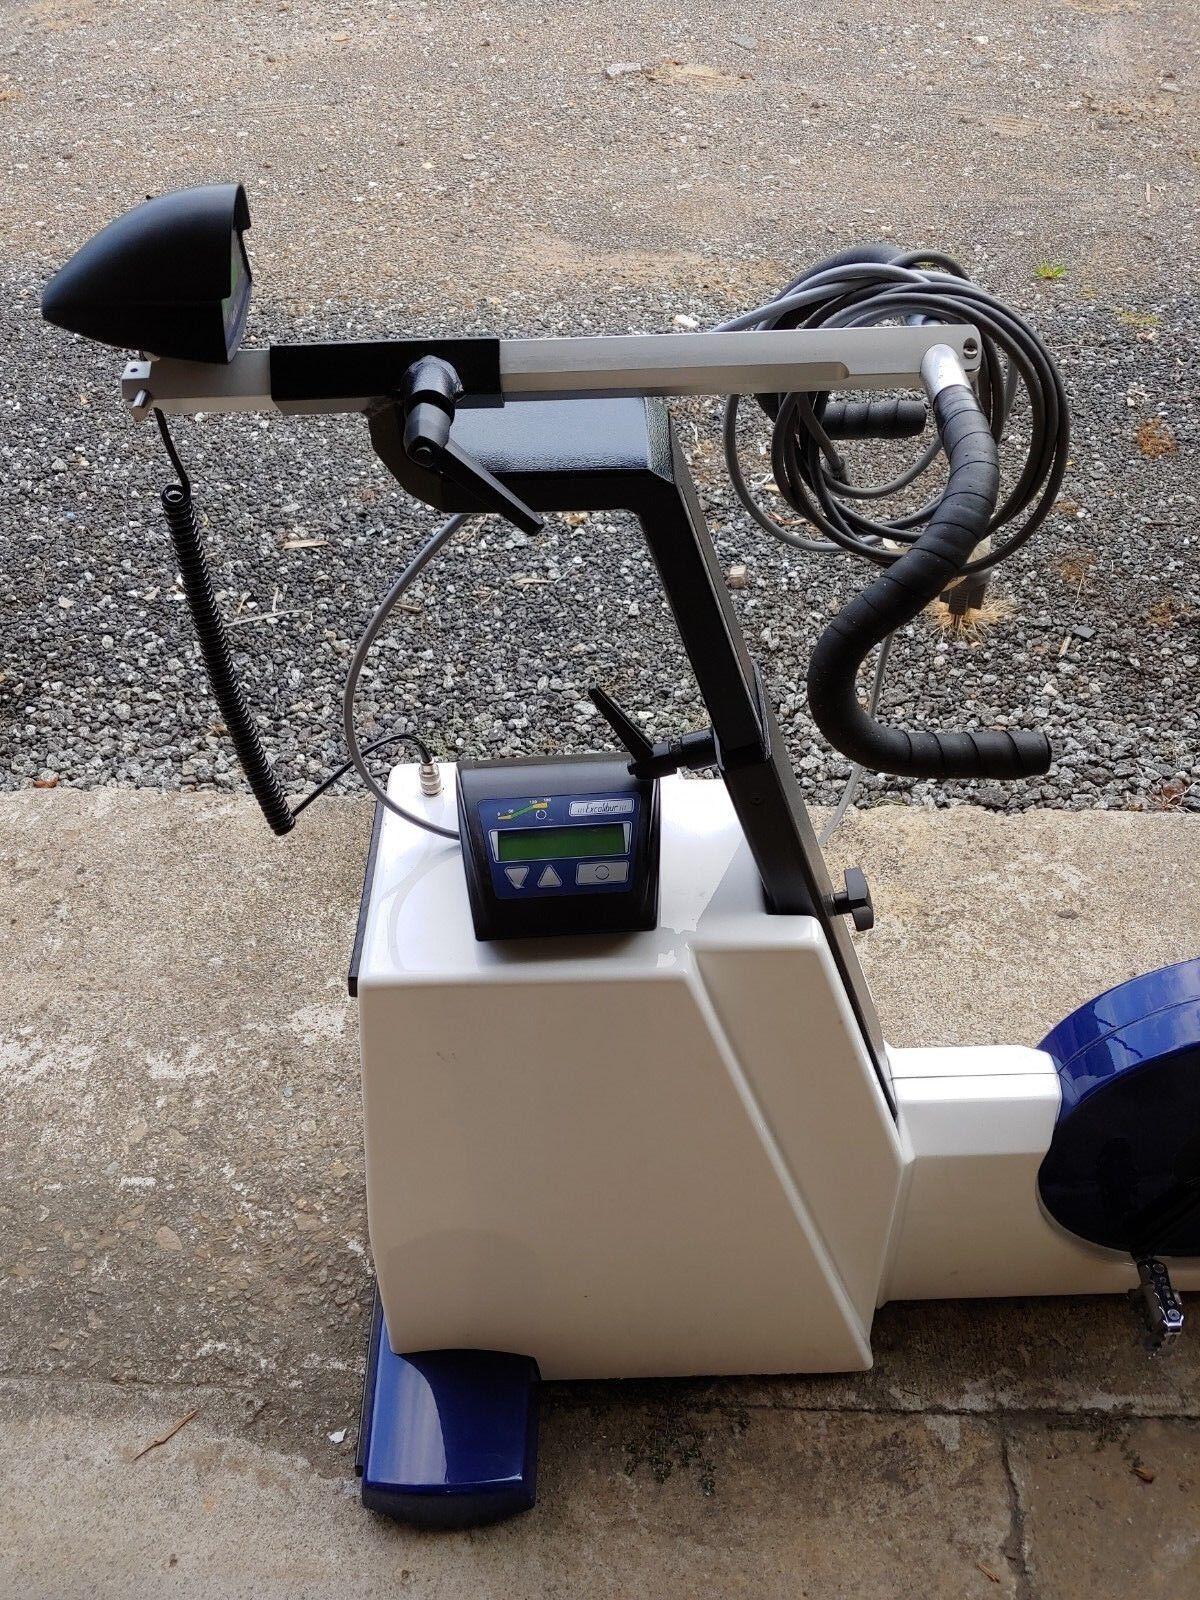 Lode Excalibur Sport 911905 Exercise Bike Fitness Test Ergometer